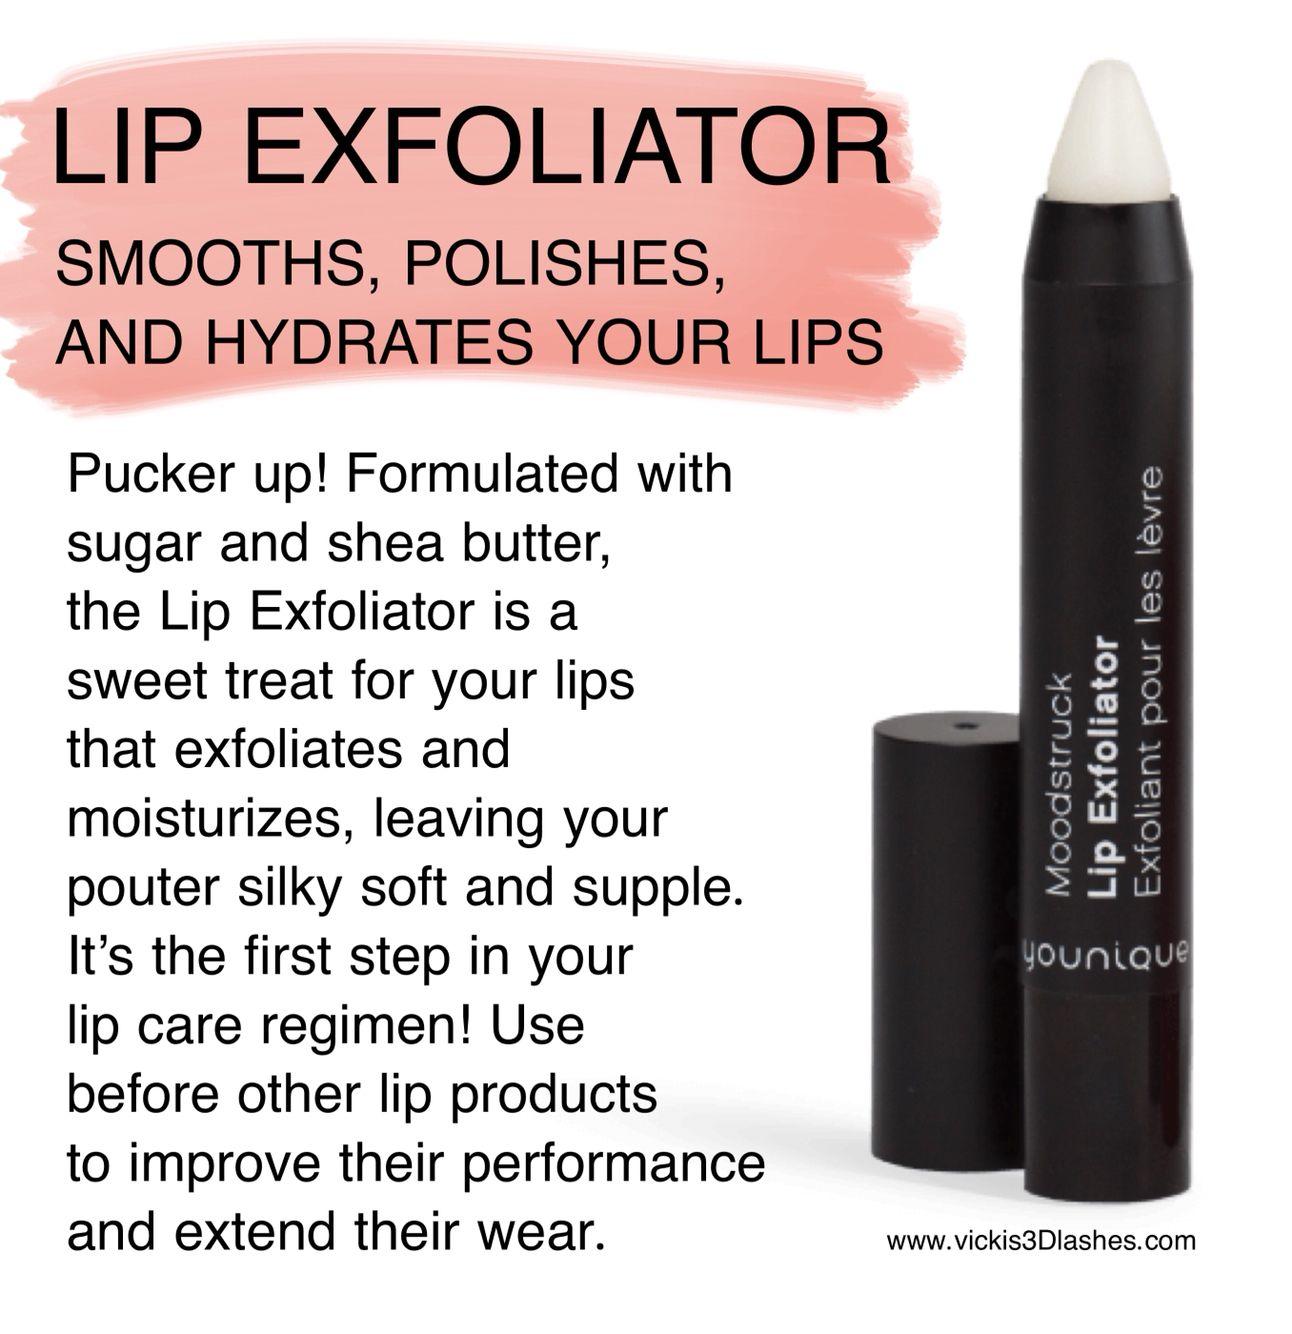 Younique's Lip Exfoliator Vicki